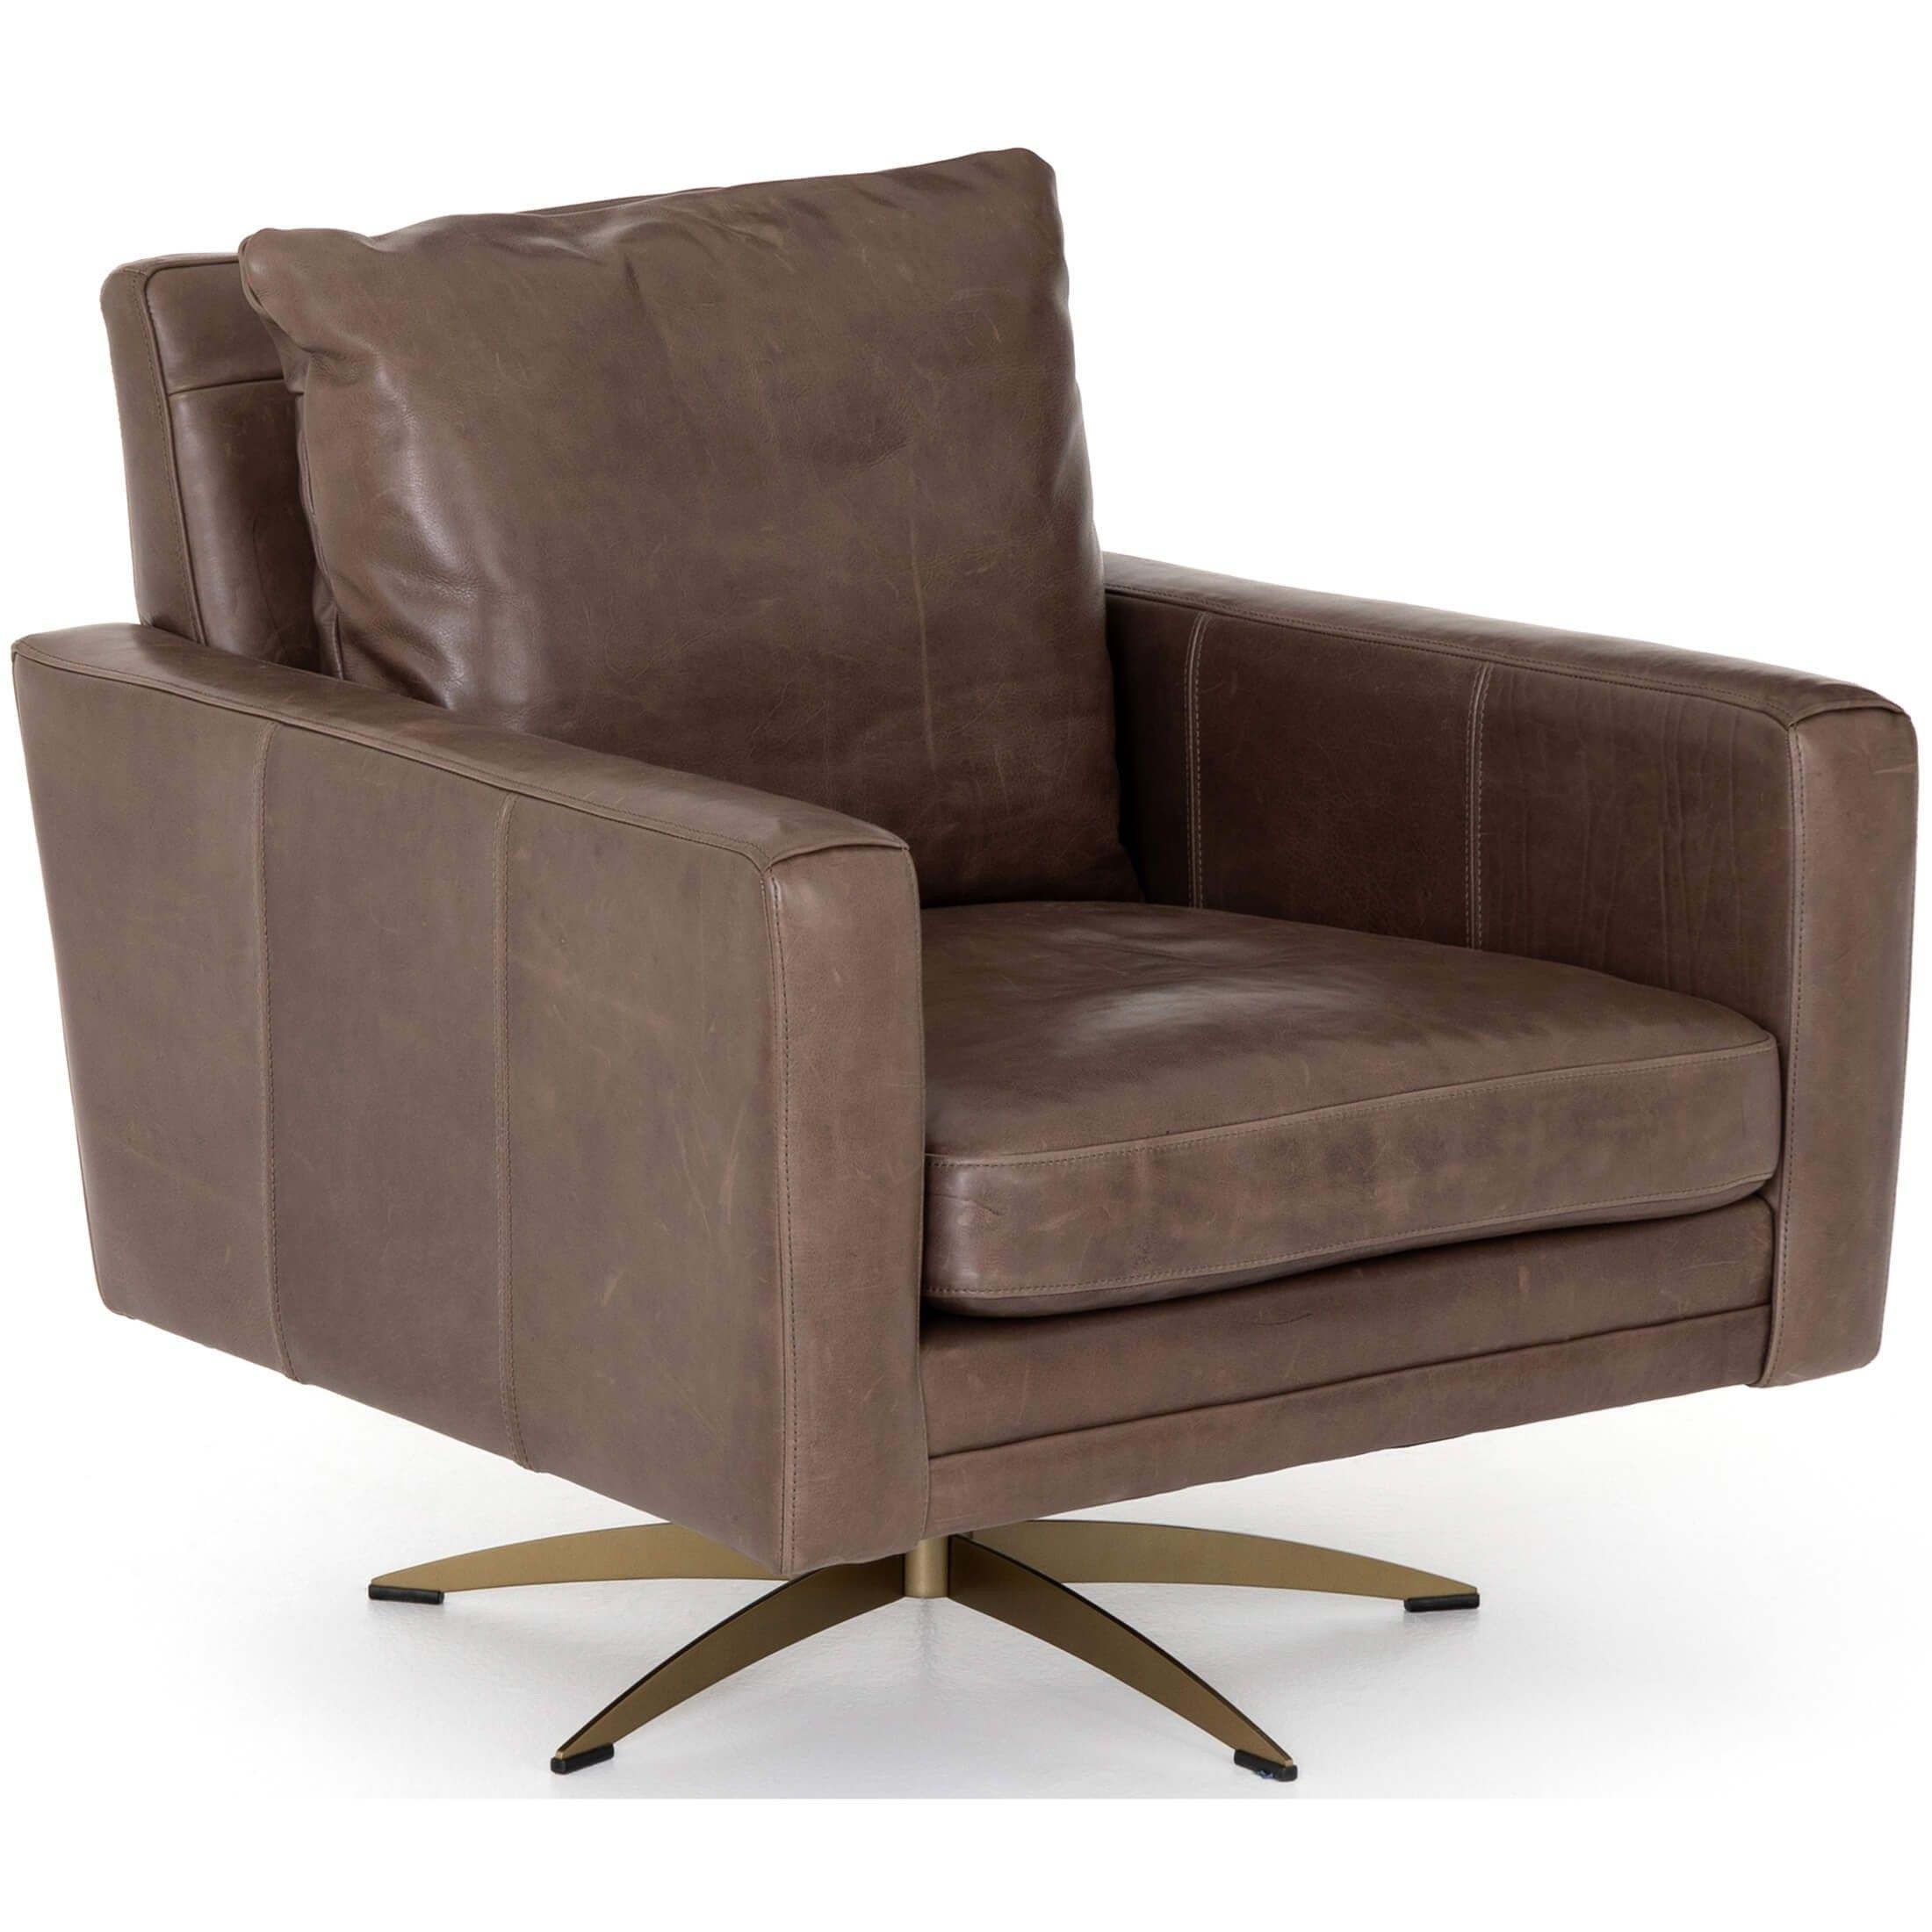 Lyndon Leather Swivel Chair Dakota Fossil Modern Swivel Chair Leather Swivel Chair Swivel Chair